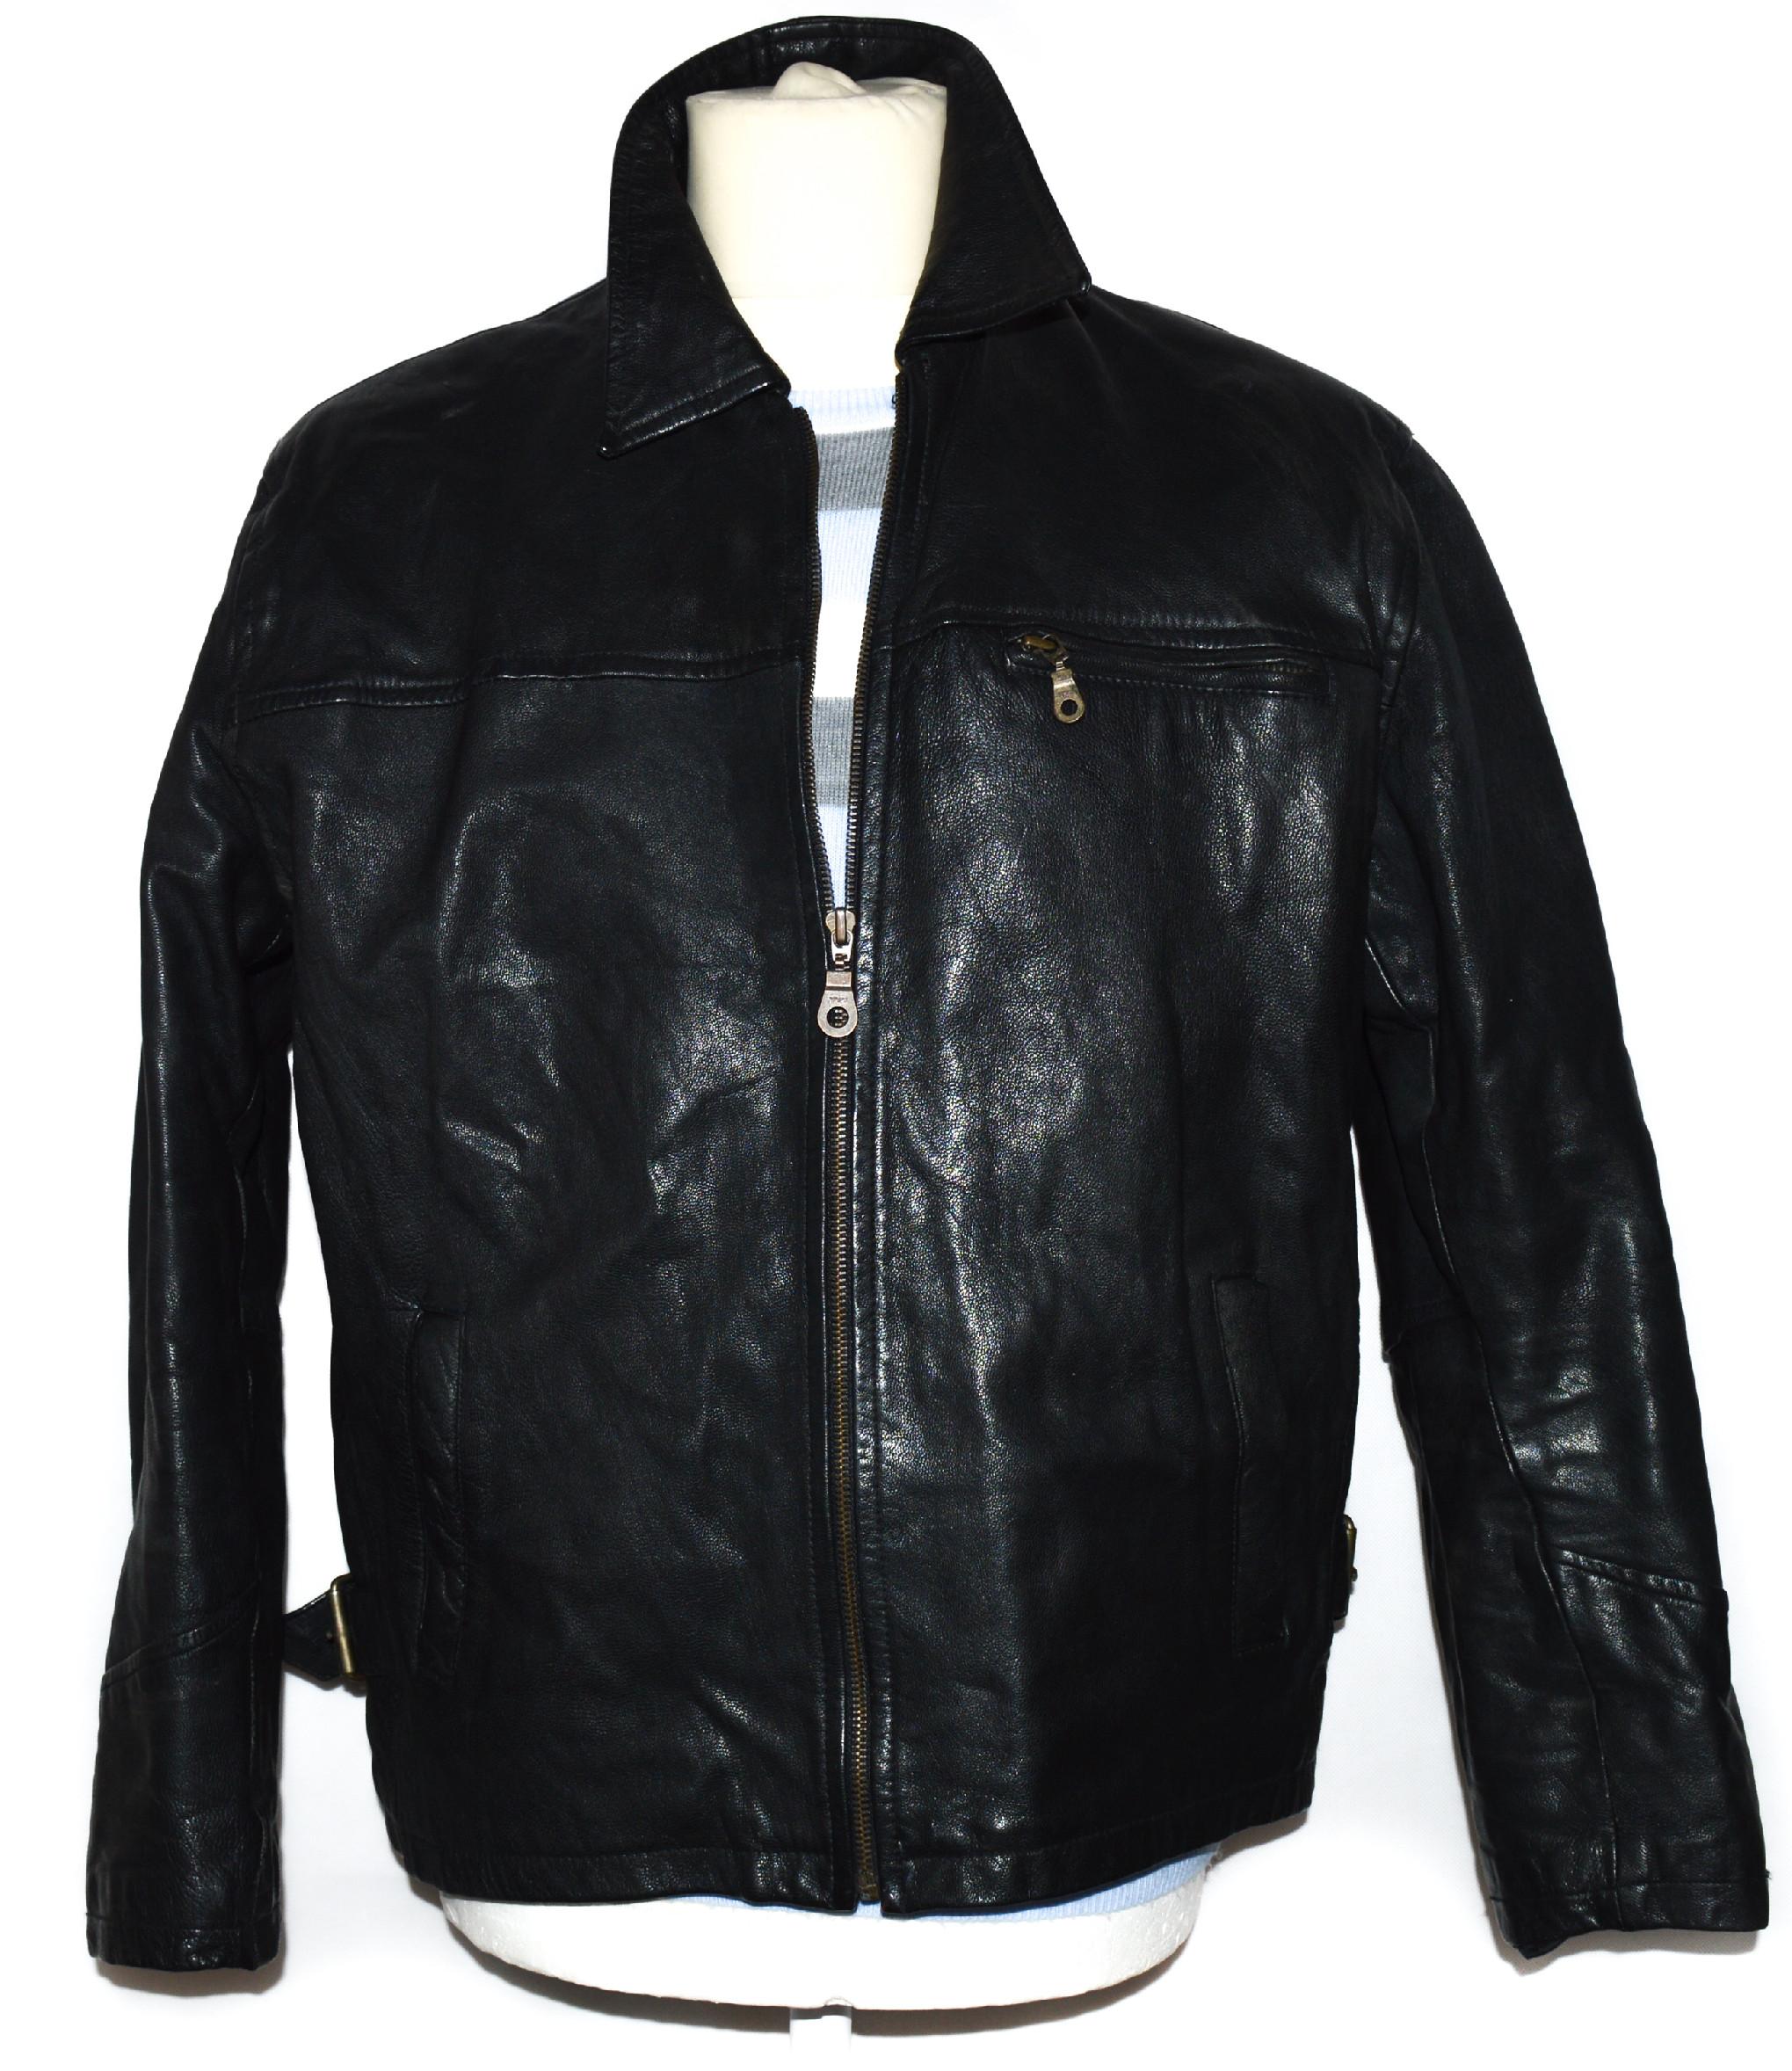 KOŽENÁ pánská černá bunda na zip L/XL